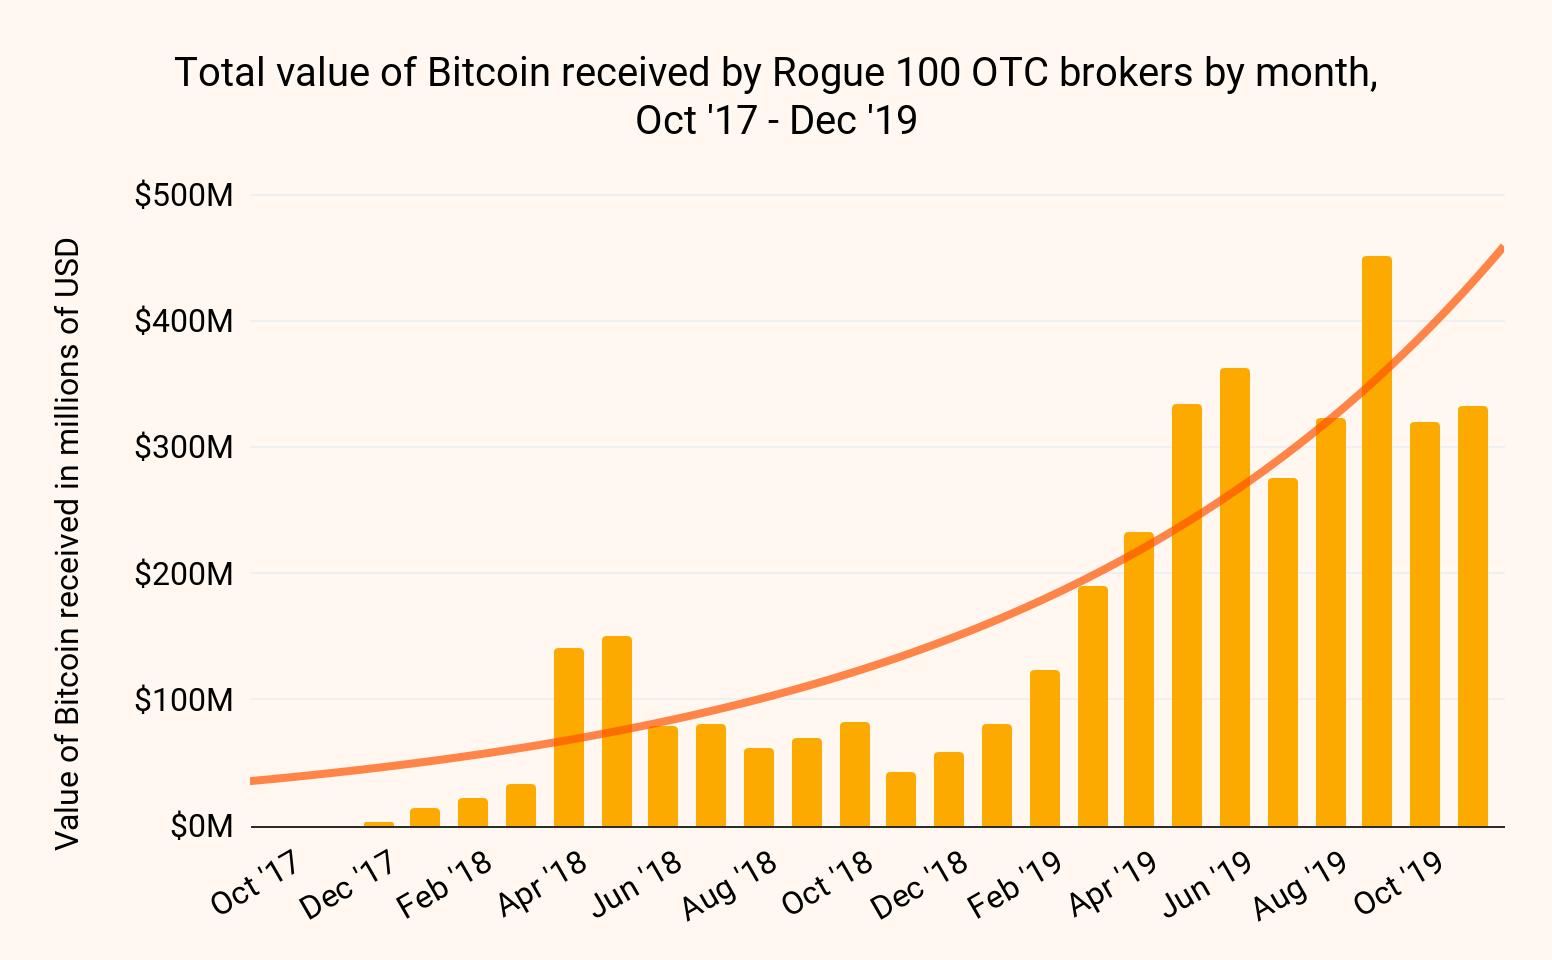 OTC brokers